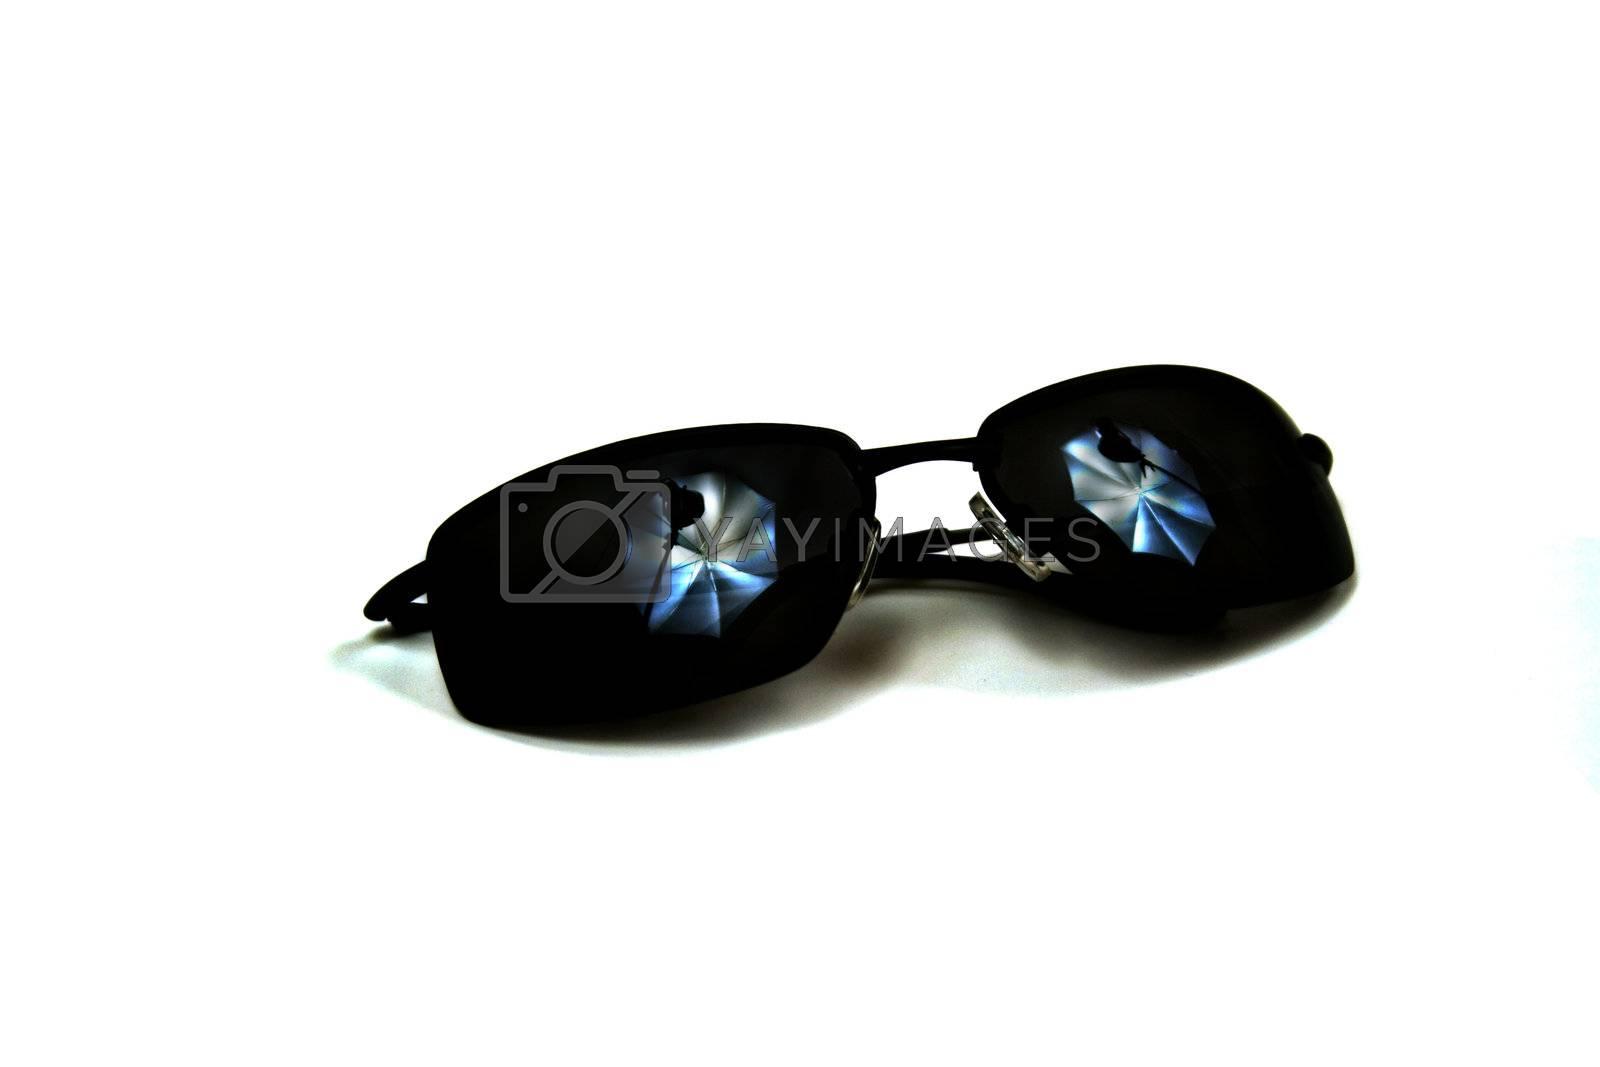 Sunglasses with Studio Lighting by mwp1969